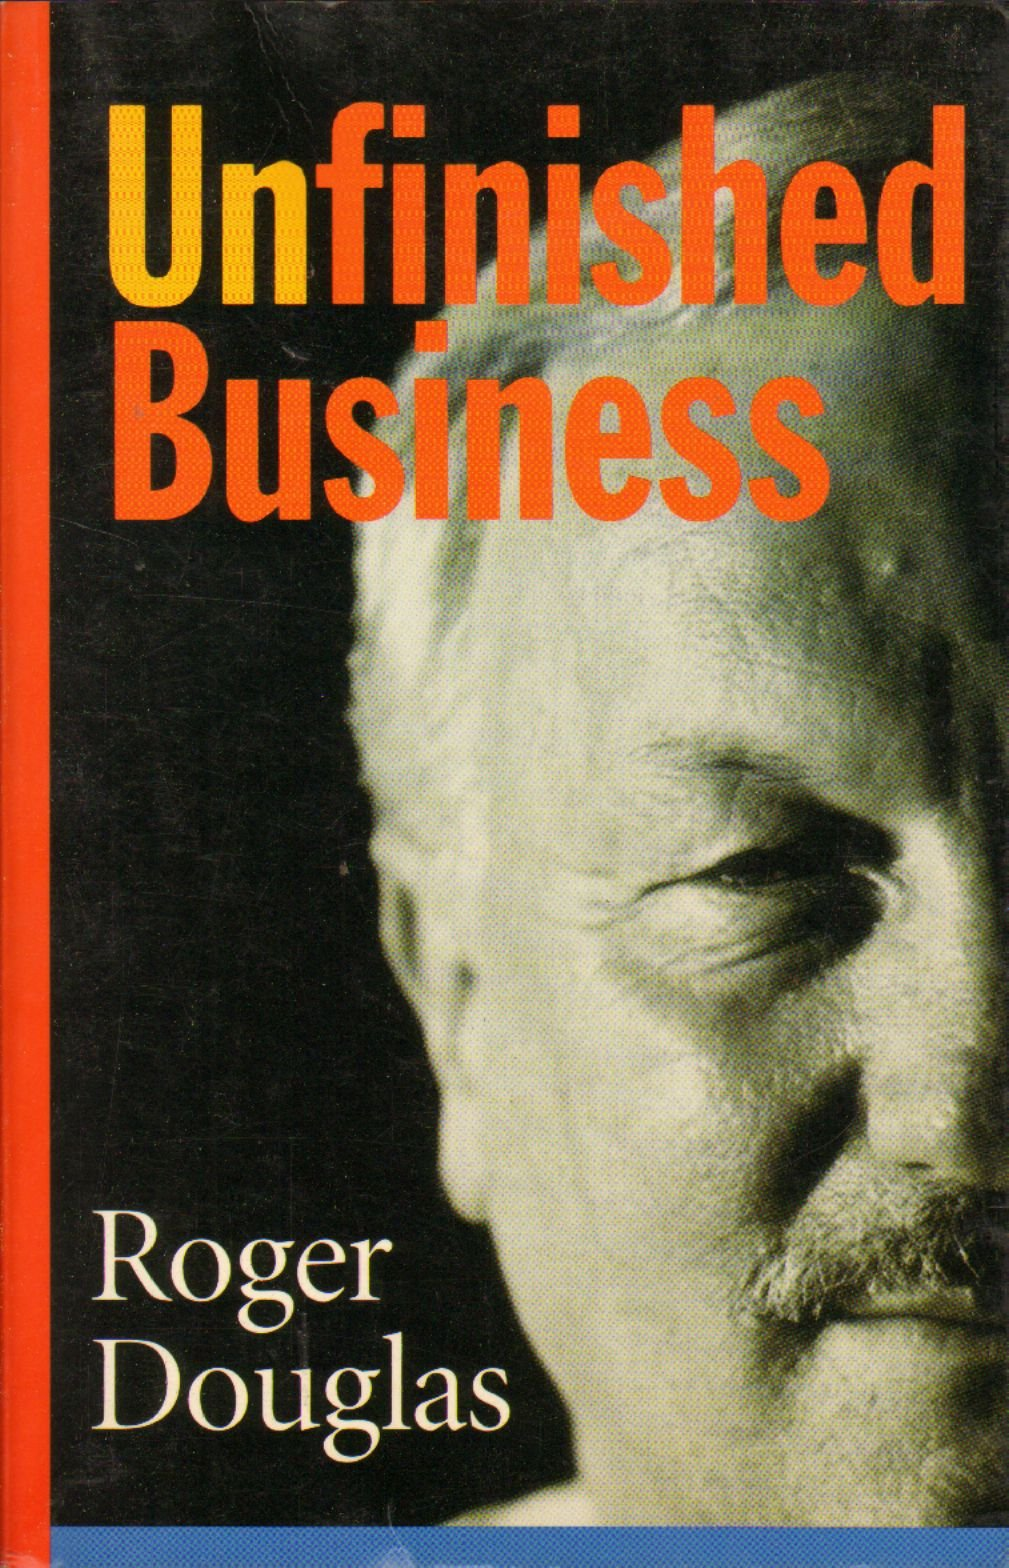 Roger Douglas